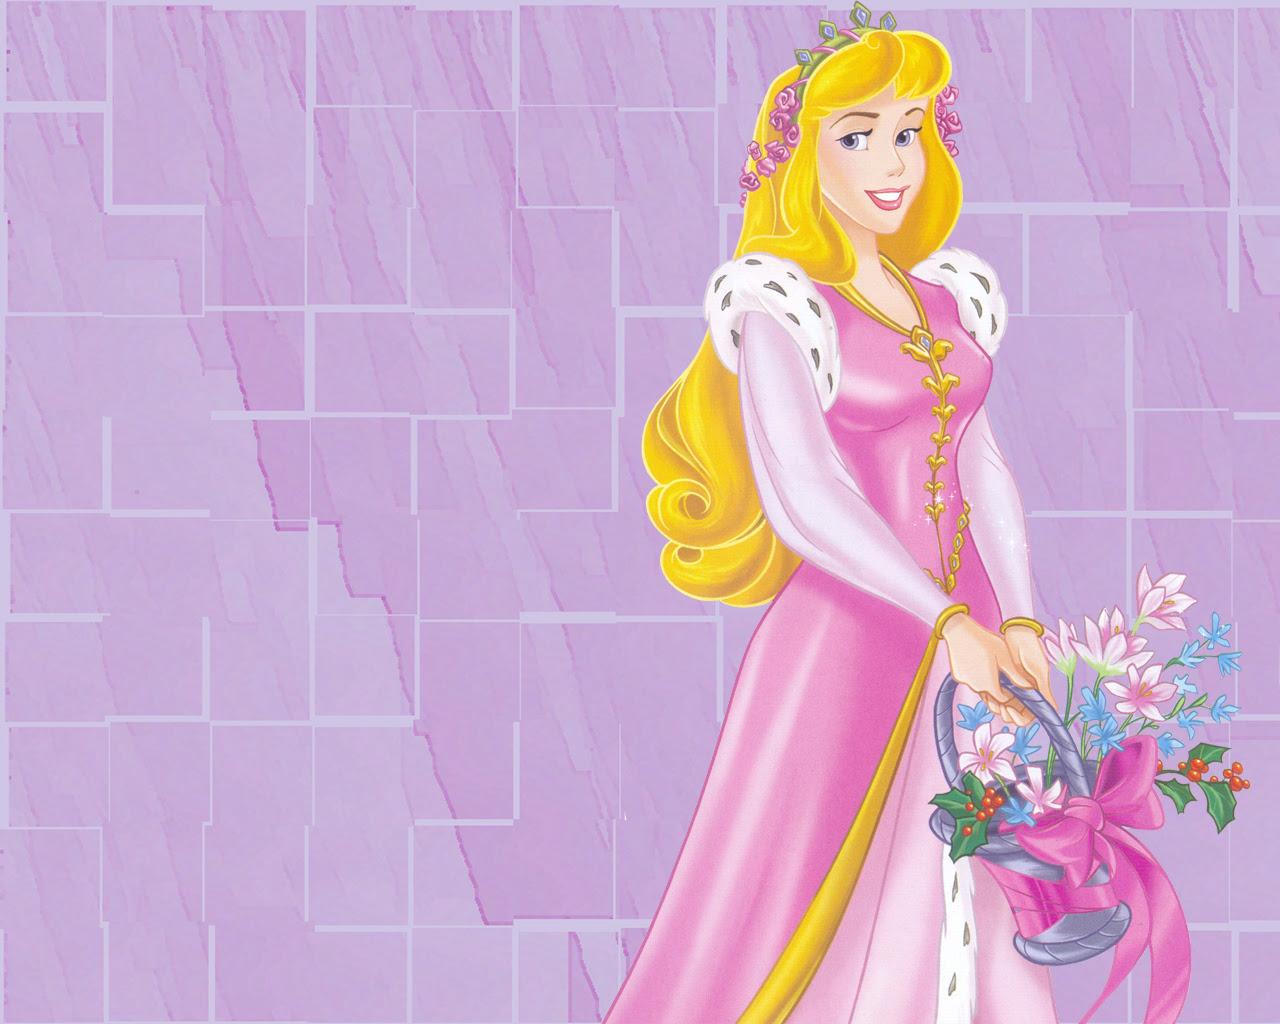 Princess Aurora - Disney Wallpaper (18514427) - Fanpop